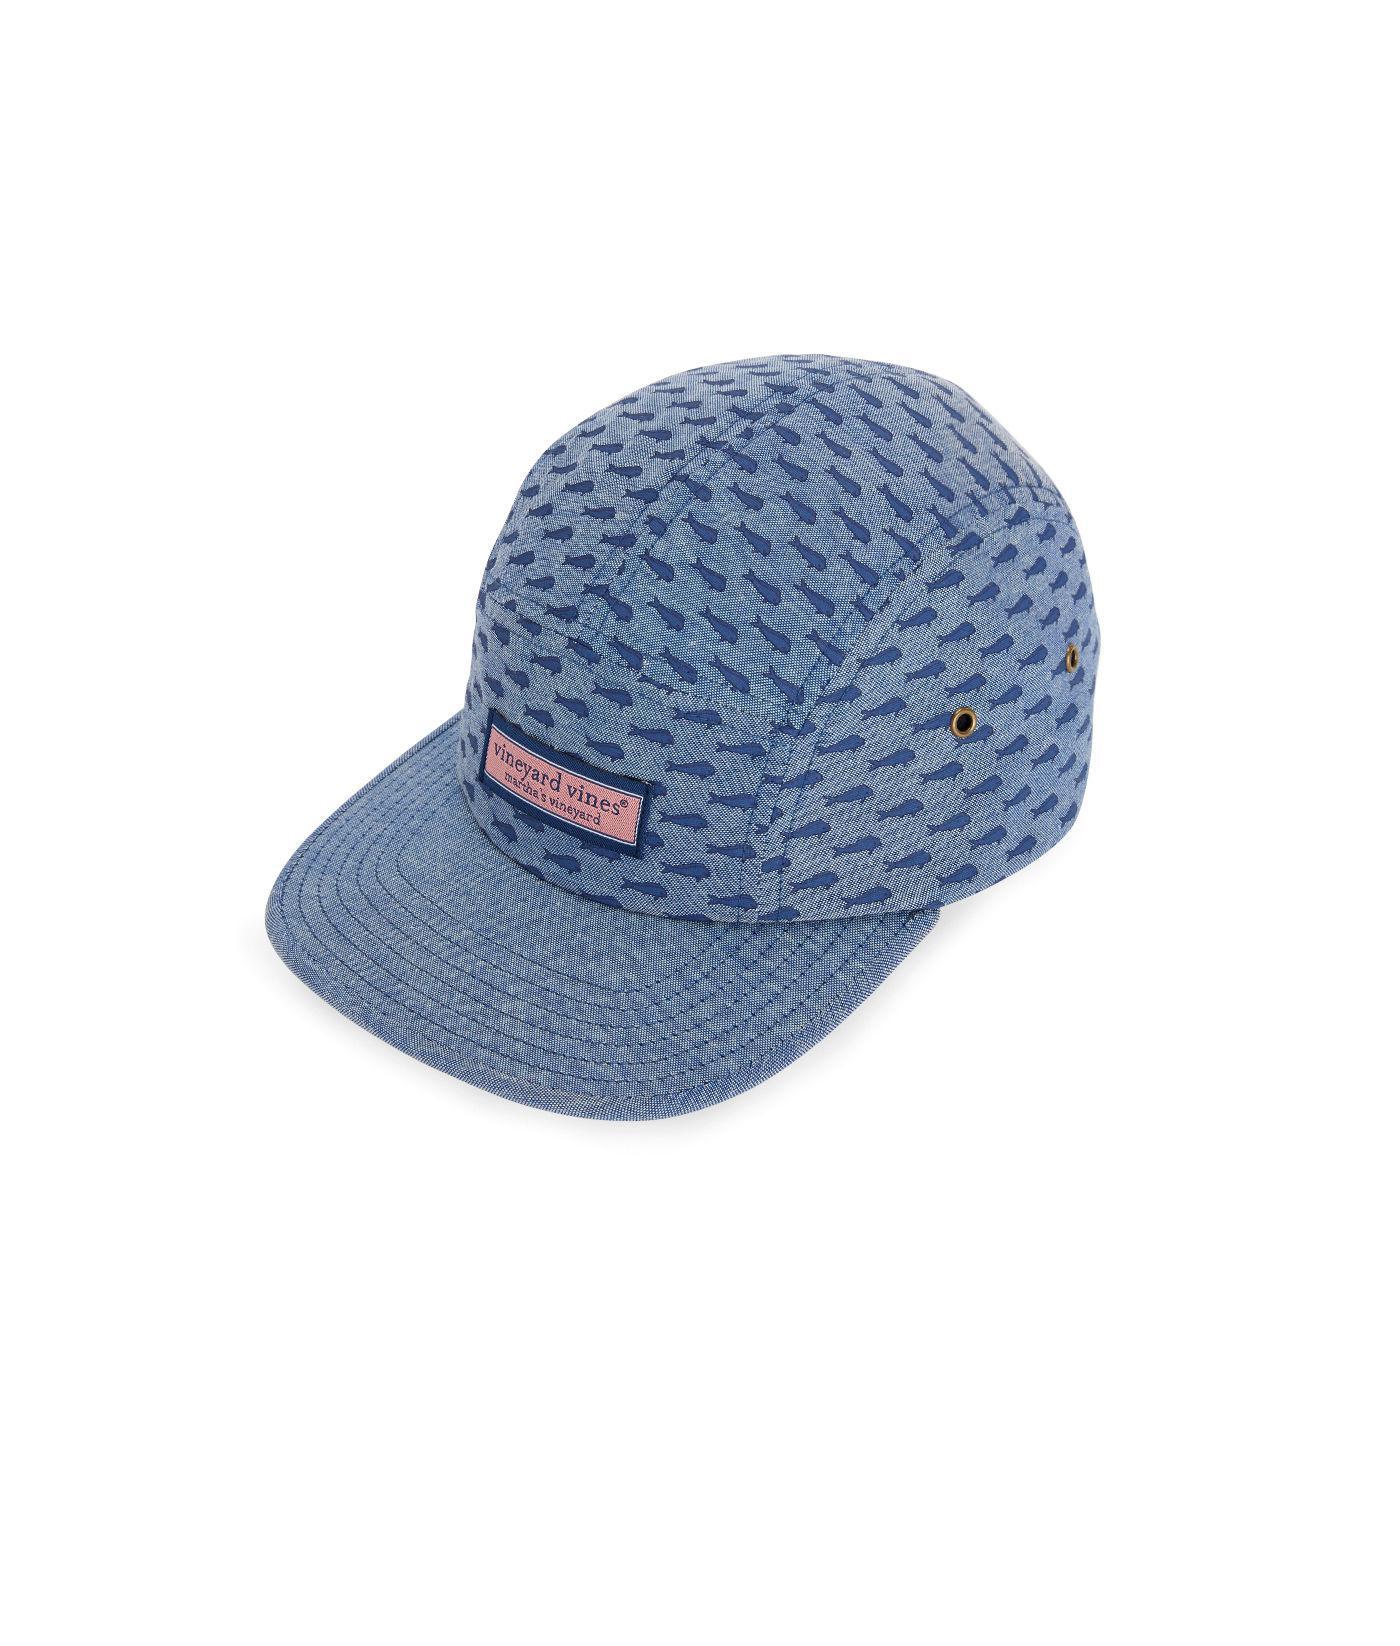 8eab69be06dd8 Lyst - Vineyard Vines Fish Printed Five Panel Hat in Blue for Men